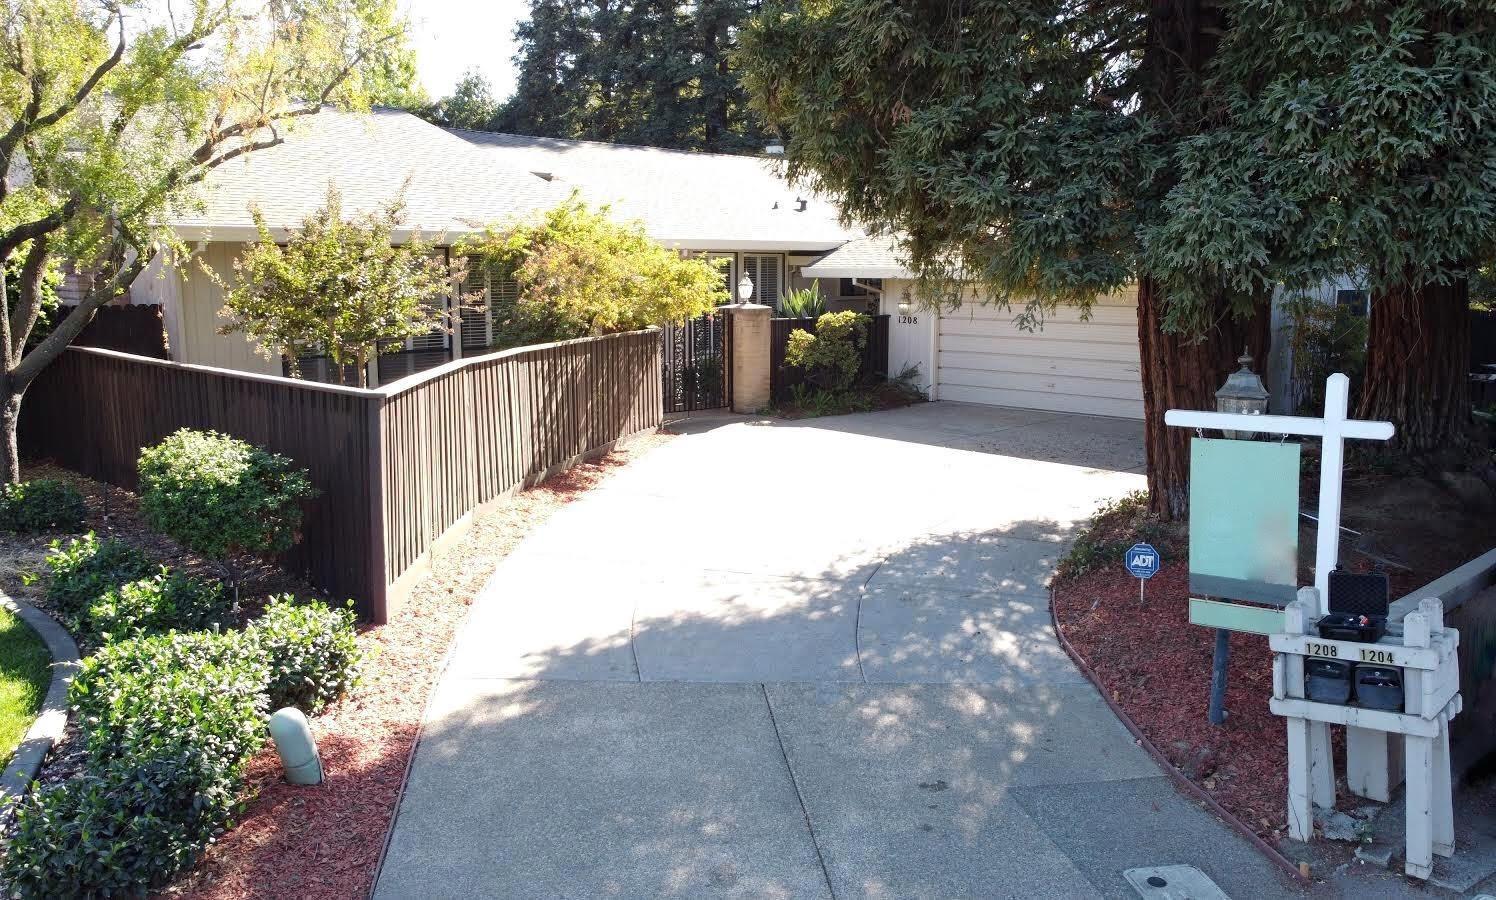 Photo of 1208 Genesee Court, Carmichael, CA 95608 (MLS # 20053809)